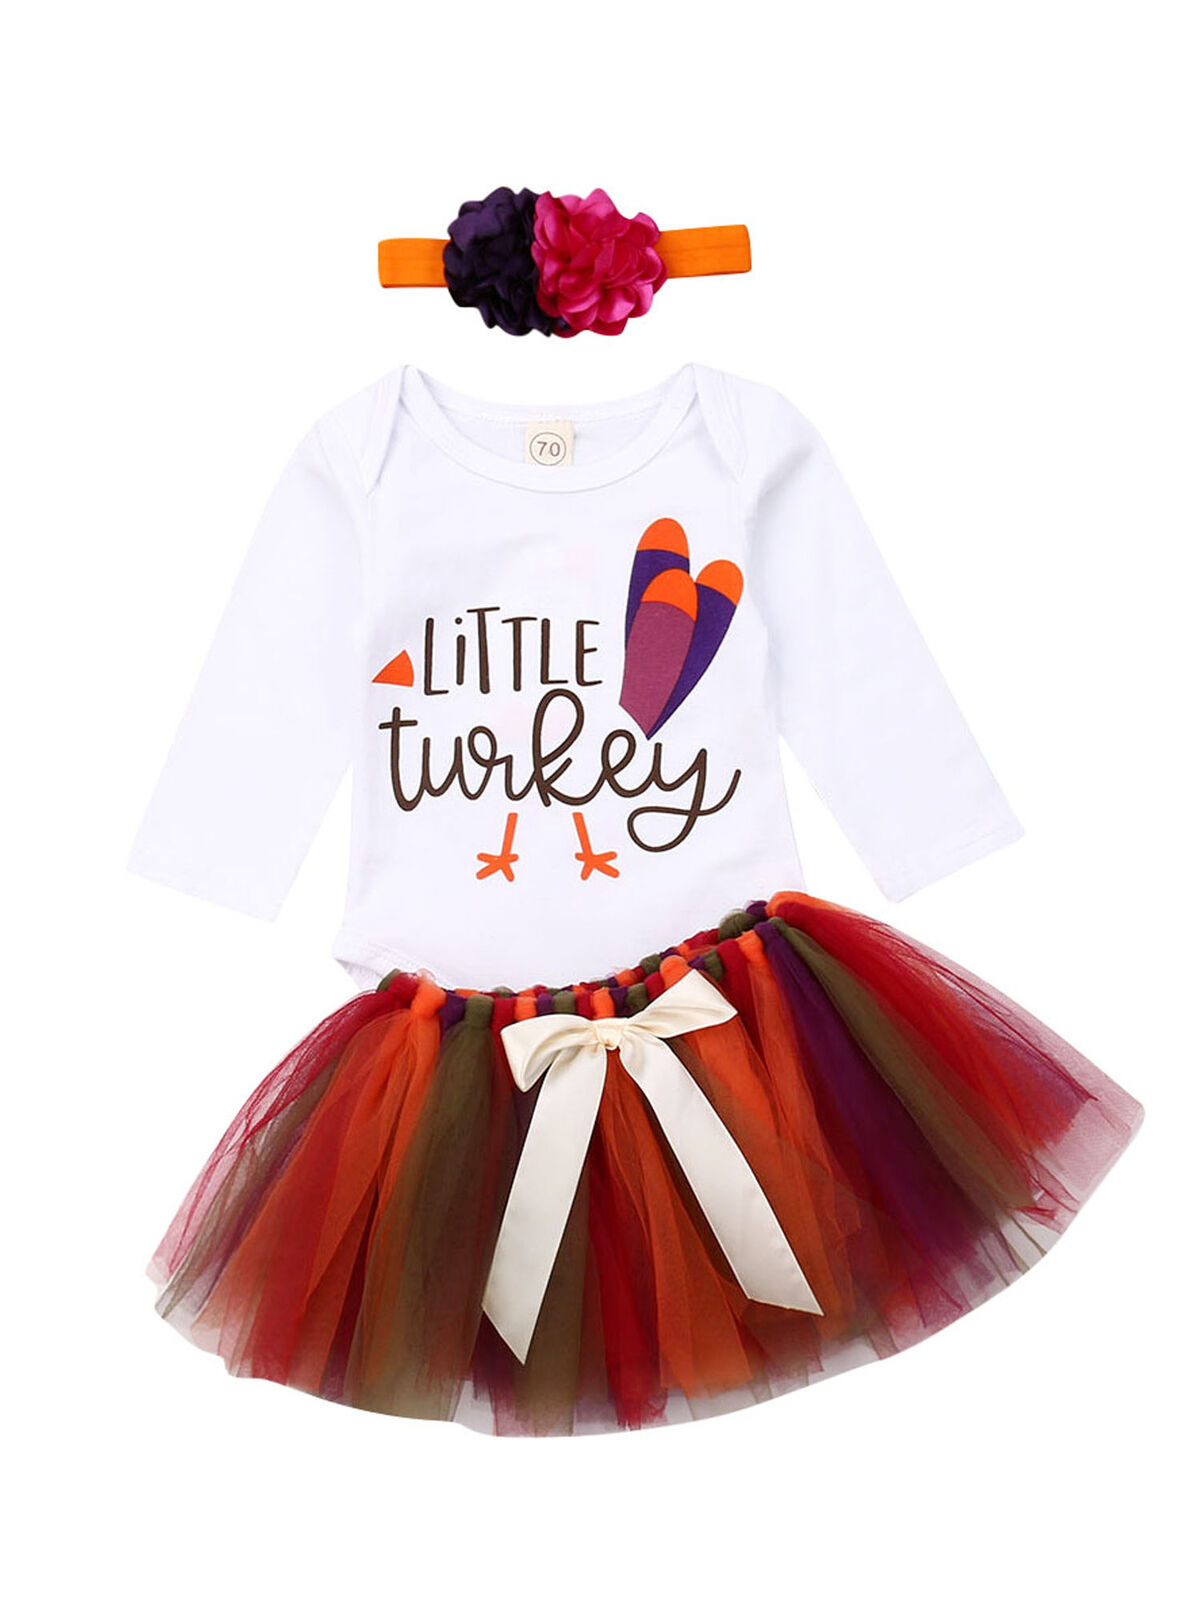 4pcs Baby Kid Girl 1st Birthday Thanksgiving Outfits Socks+Headband+Top+Skirt N